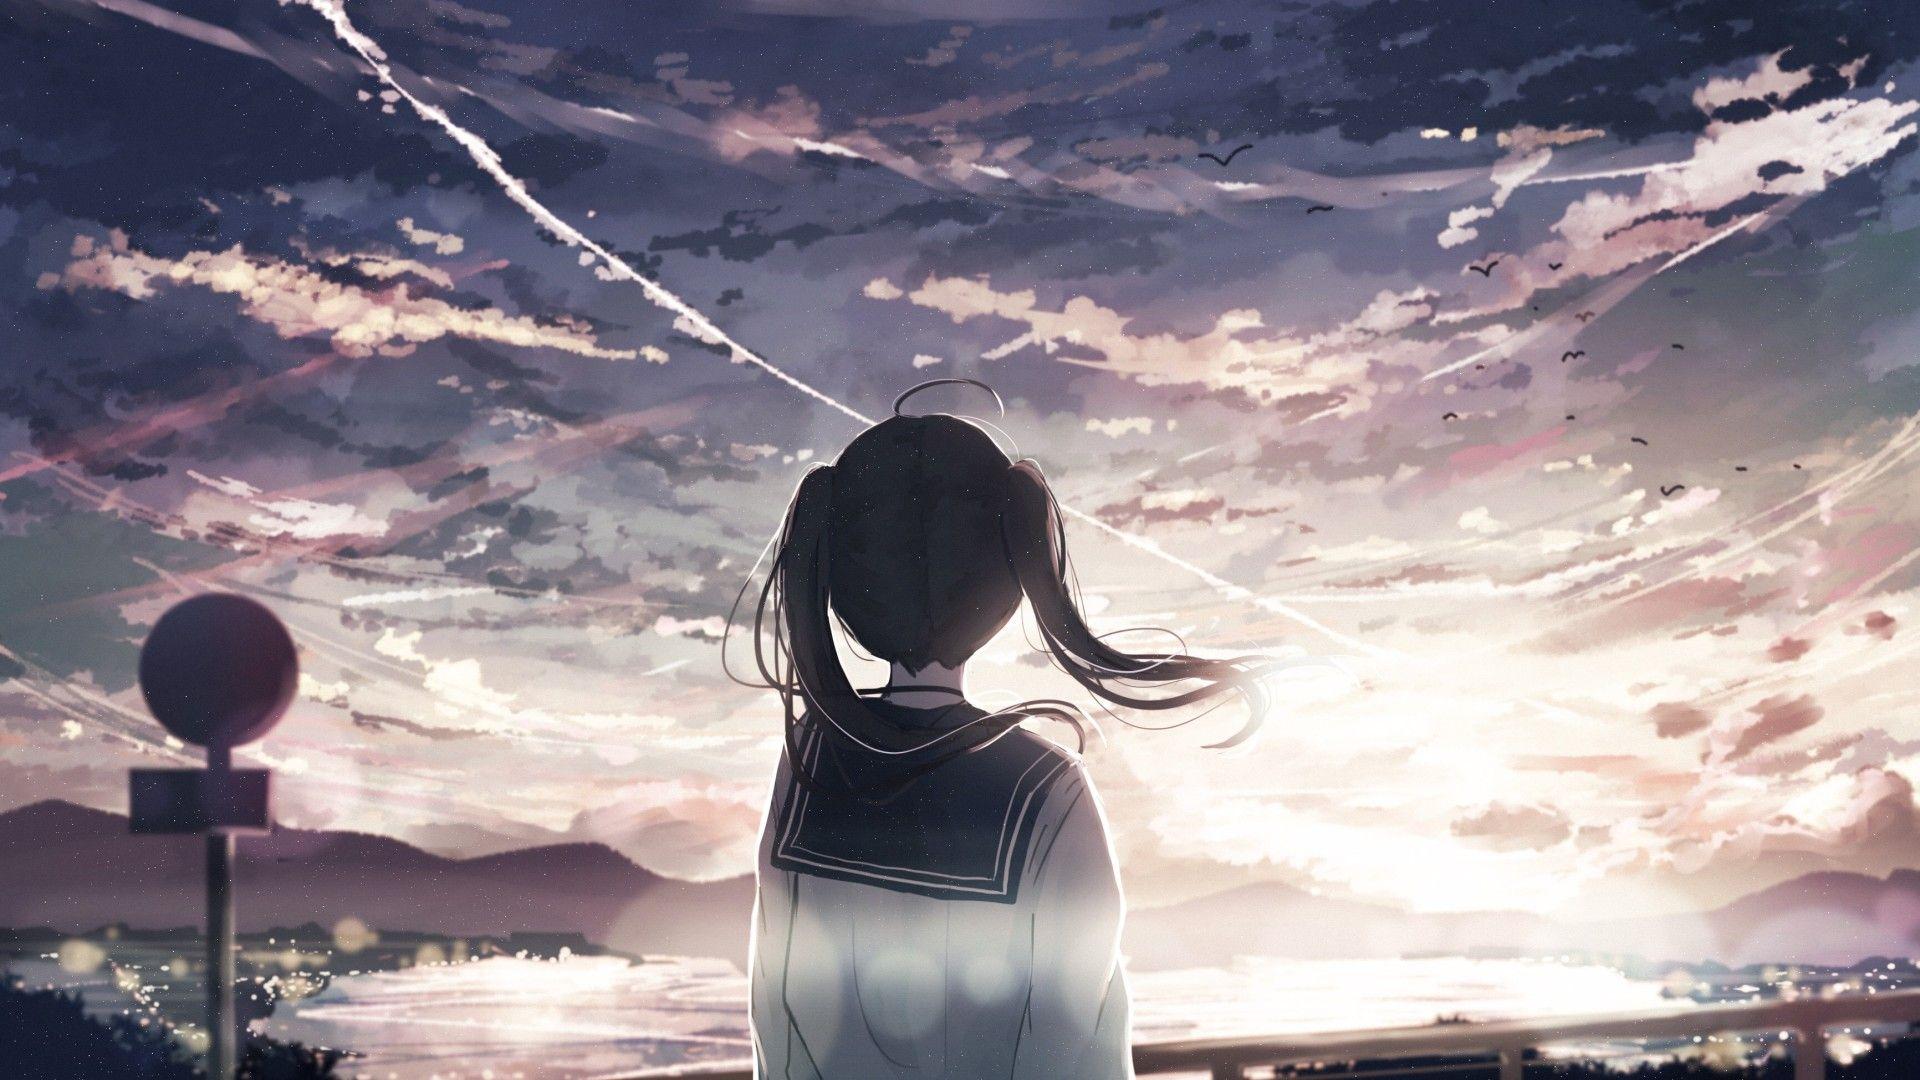 1080p Anime Smoking Girl Wallpapers - Wallpaper Cave